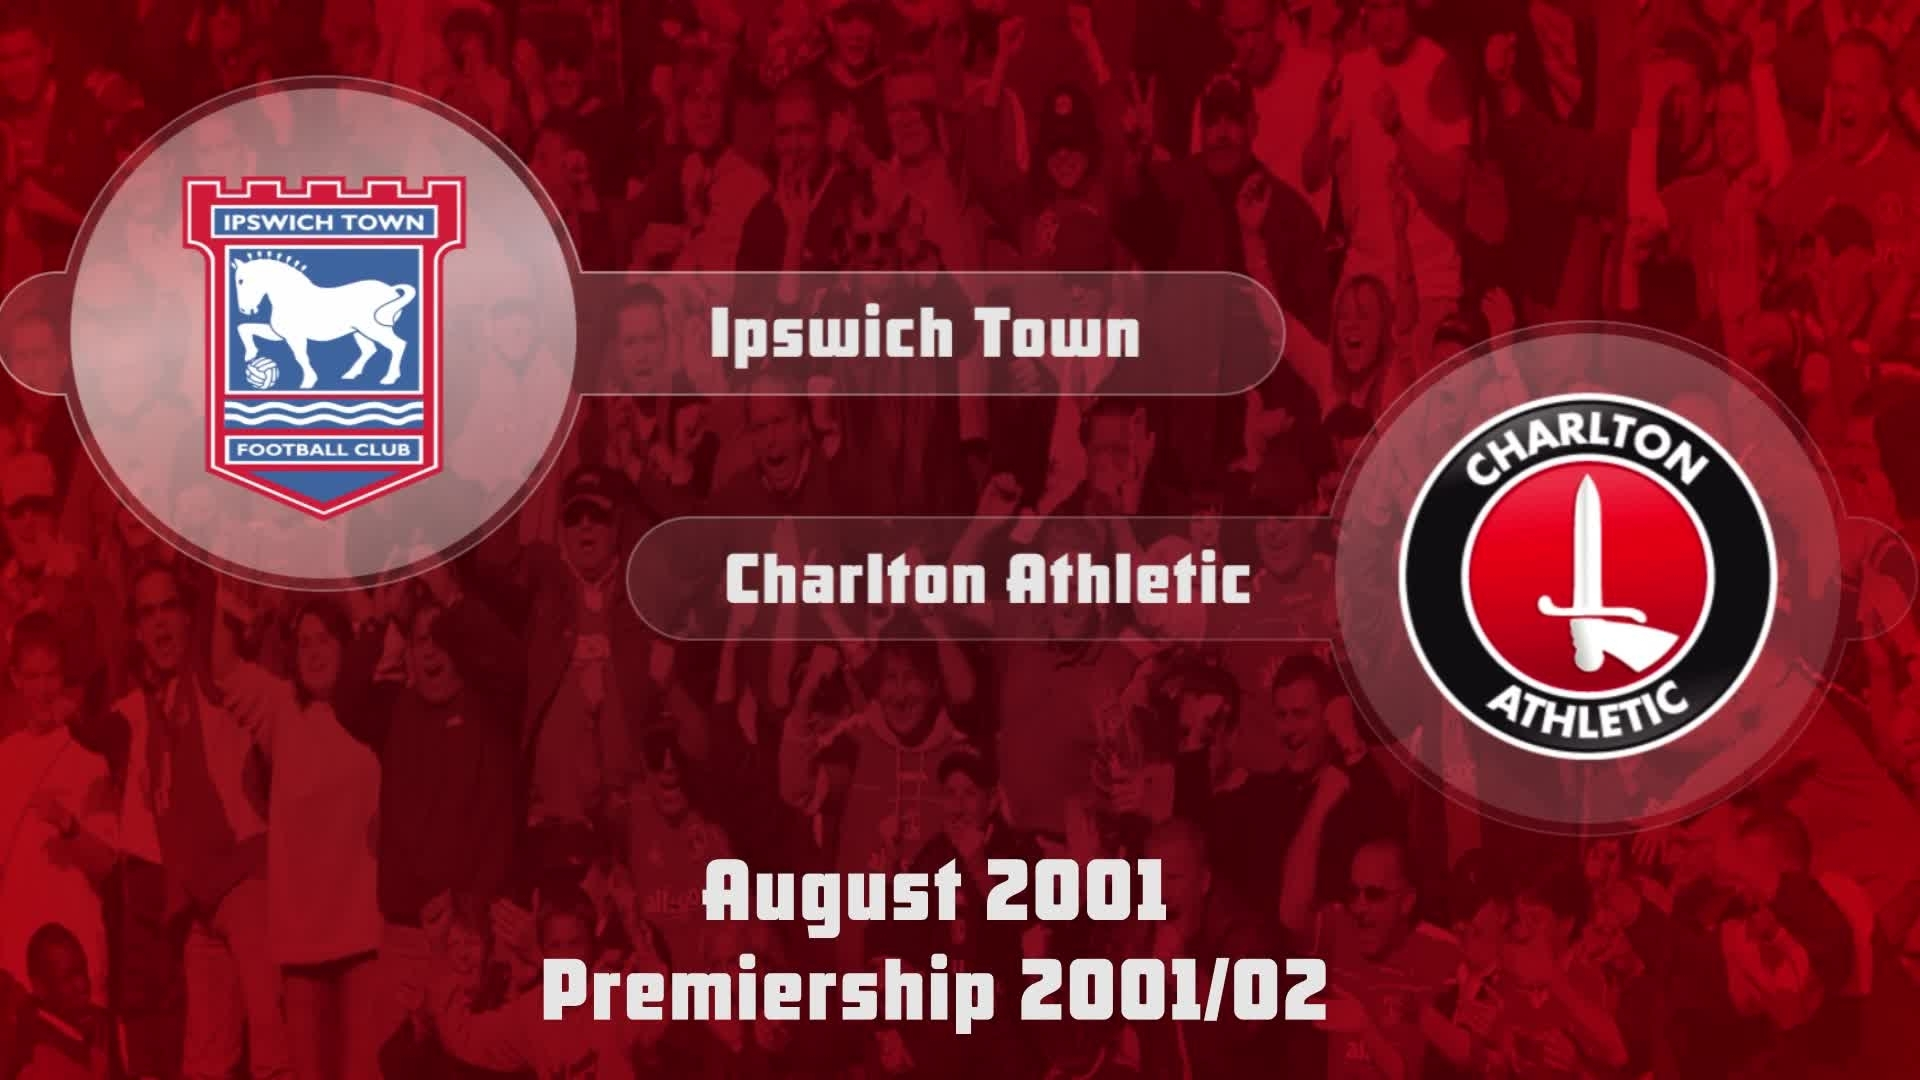 02 HIGHLIGHTS   Ipswich Town 0 Charlton 1 (Aug 2001)